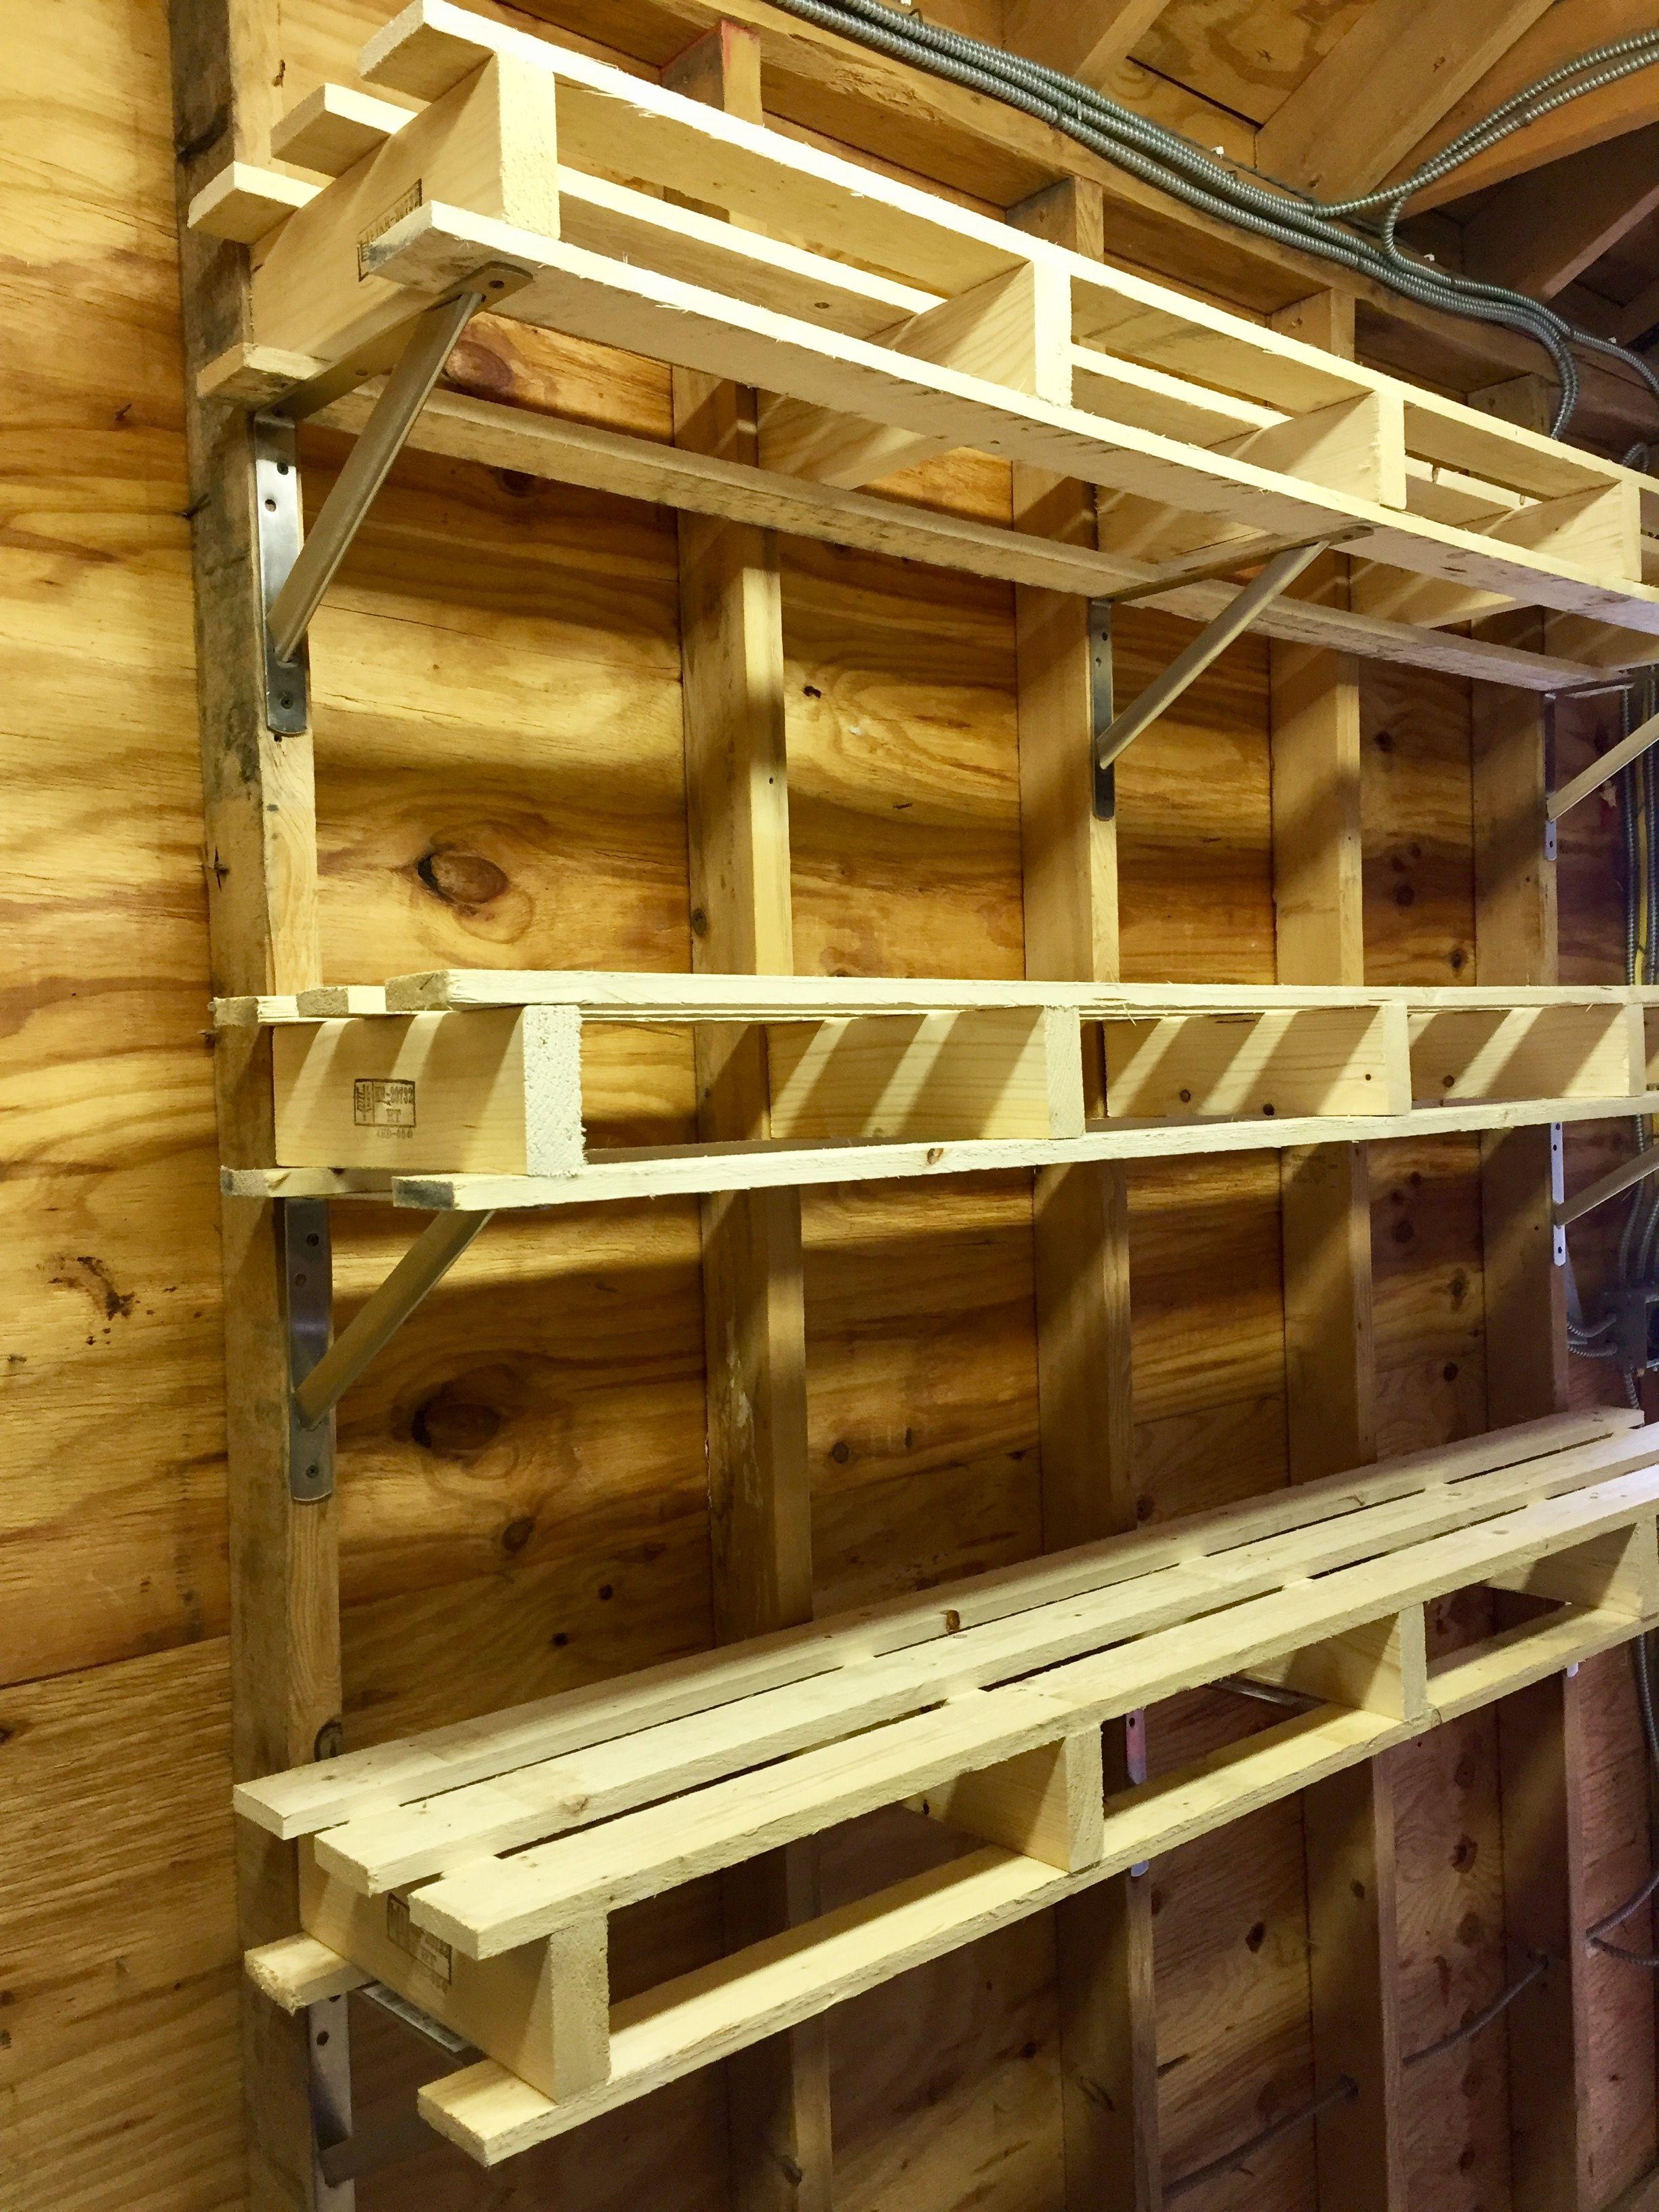 Pin by Joe DiNardo on DIY | Garage shelving, Wood shelves ...